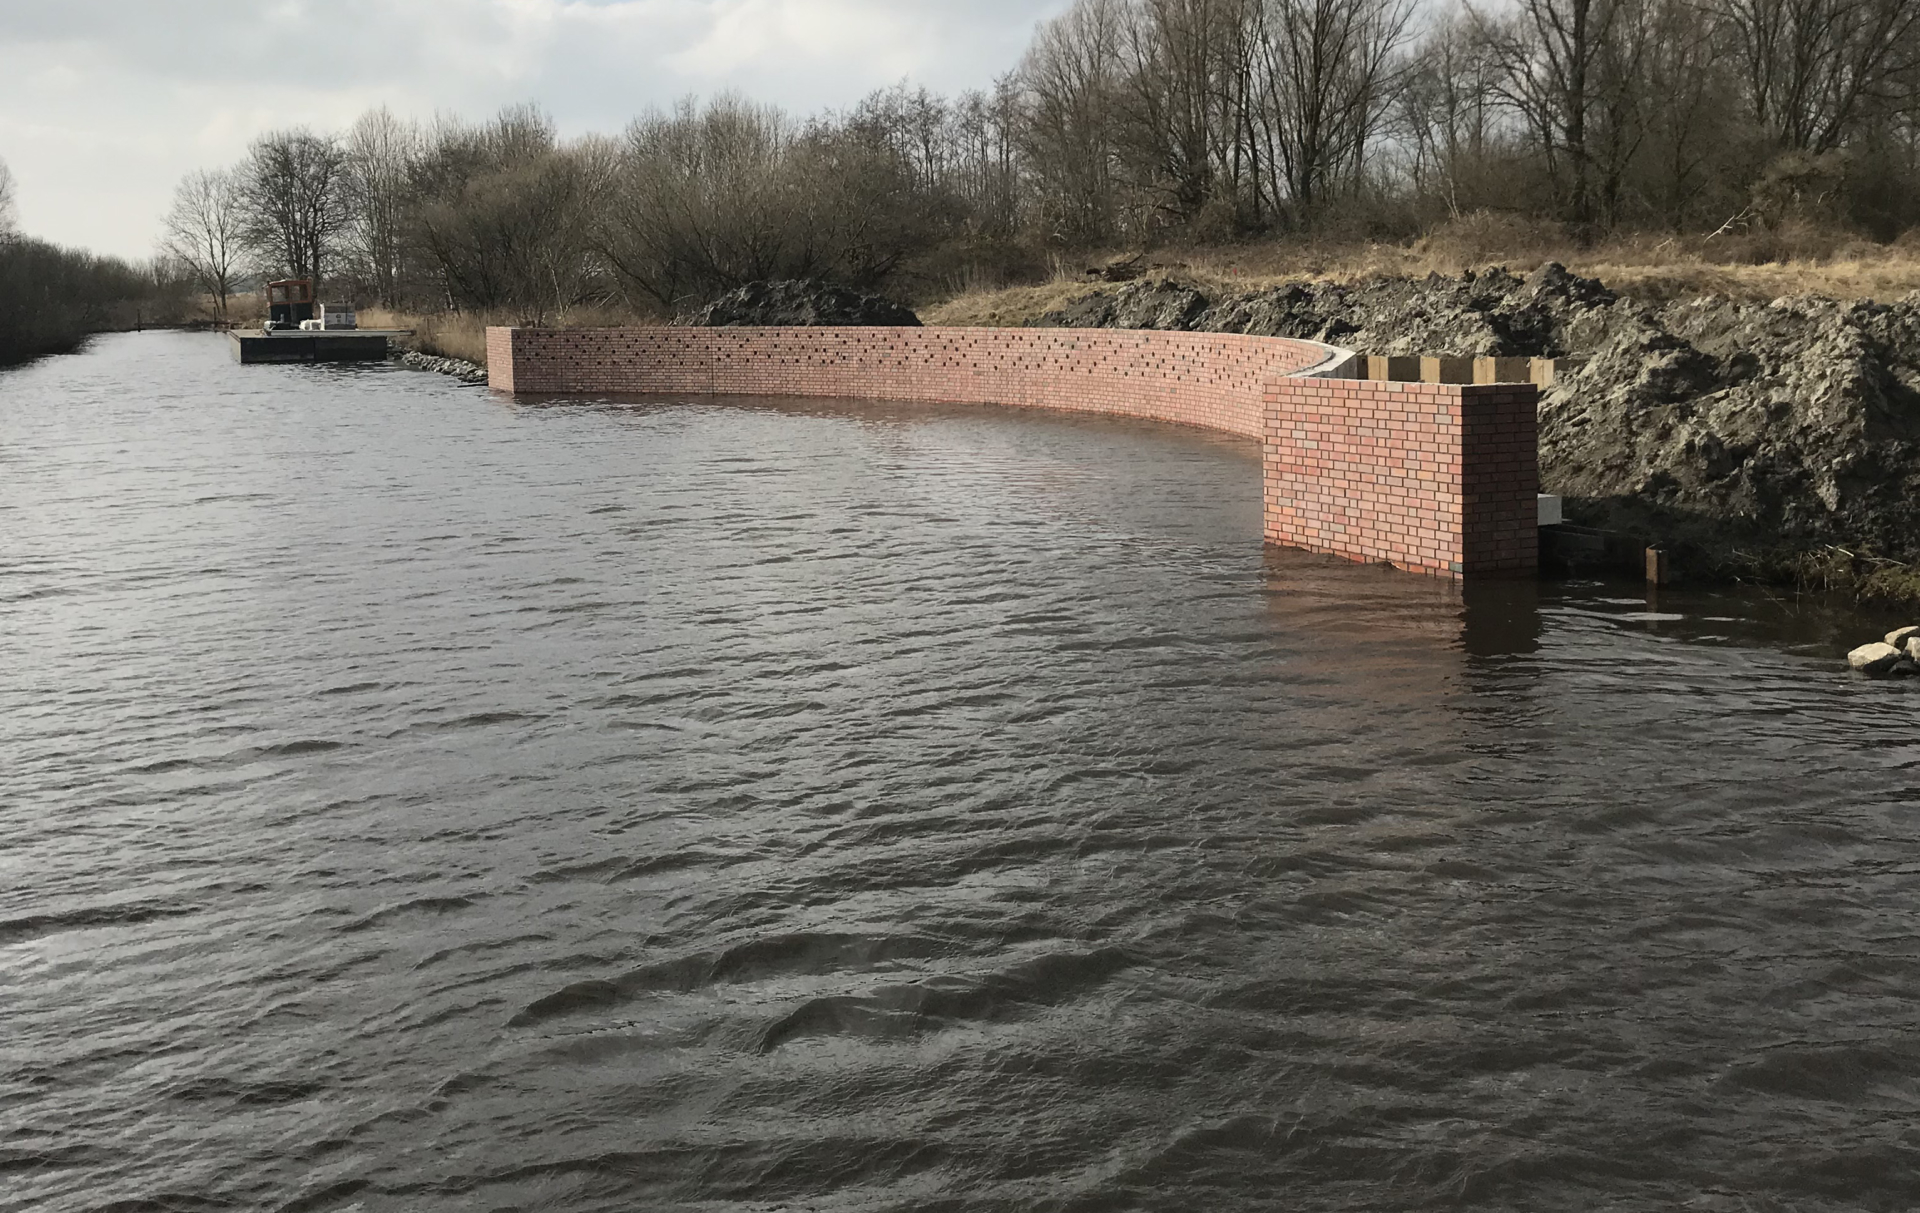 zwaluwhaven Alde Feanen